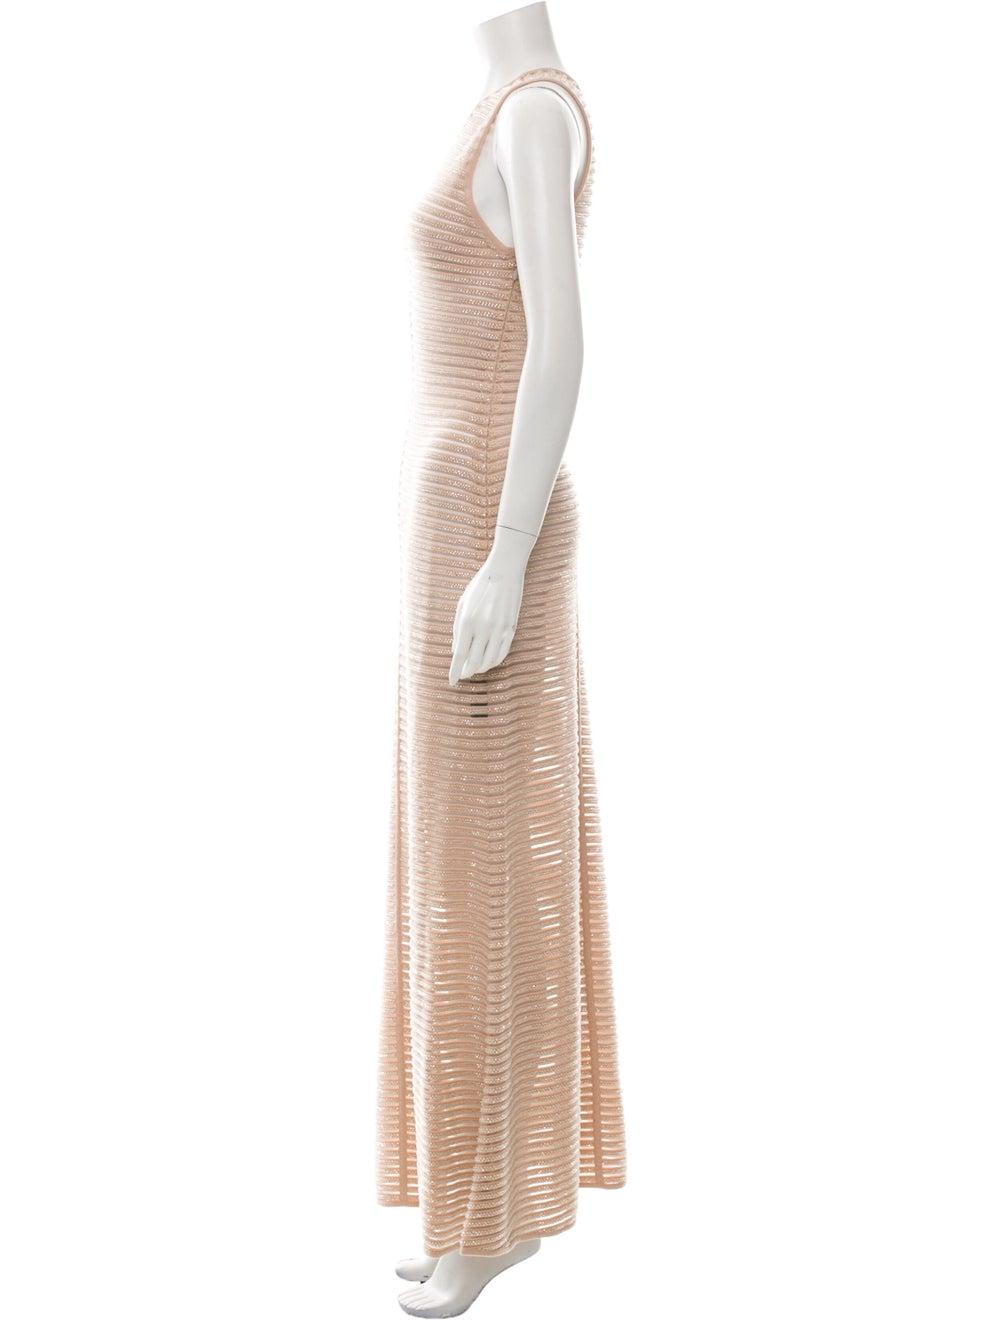 Halston Vintage Long Dress - image 2